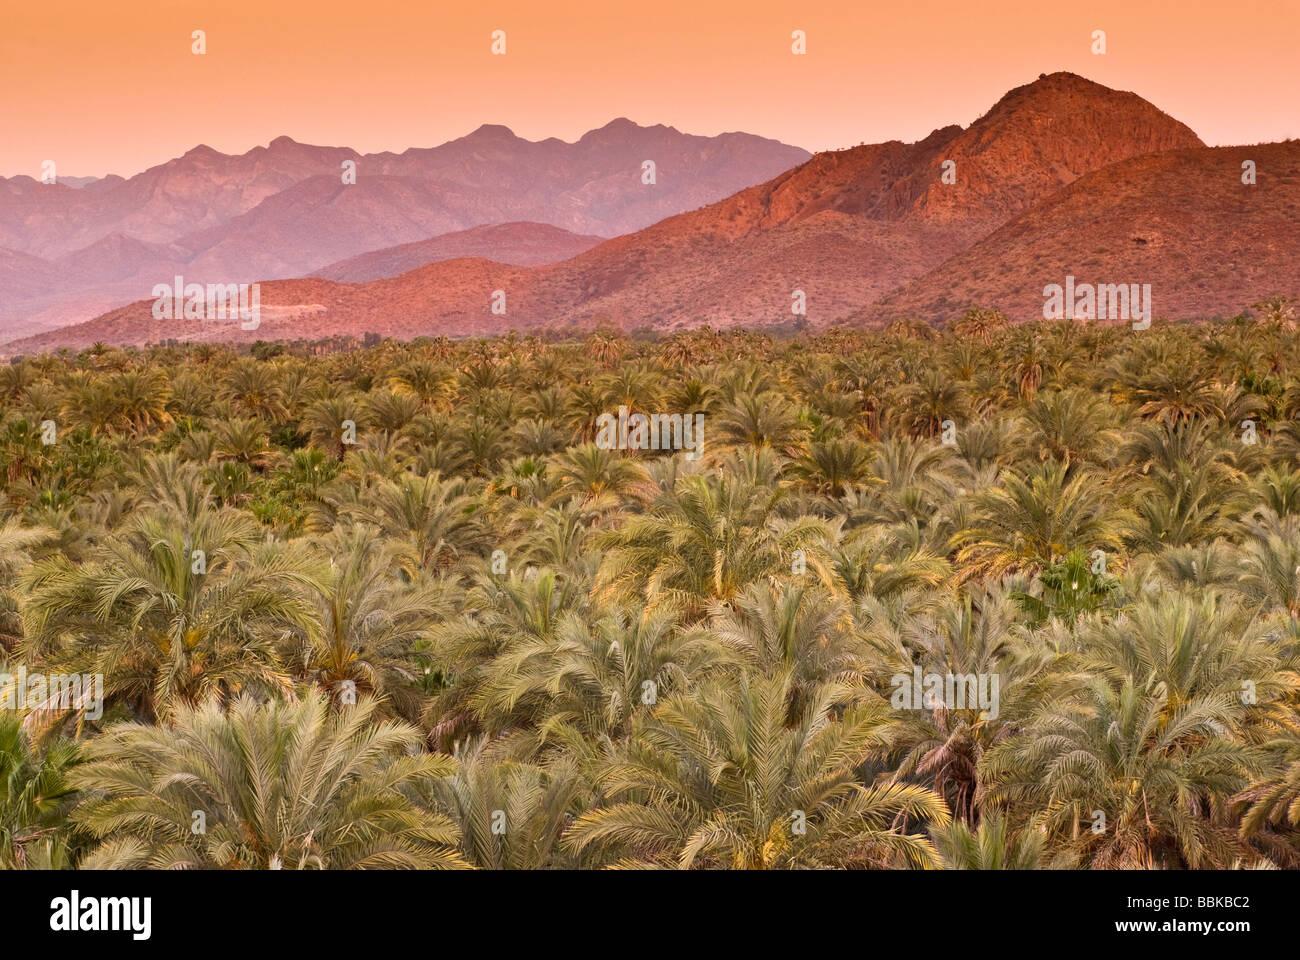 Date palms at sunrise Mulege Sierra de Guadalupe in distance Baja California Sur Mexico - Stock Image